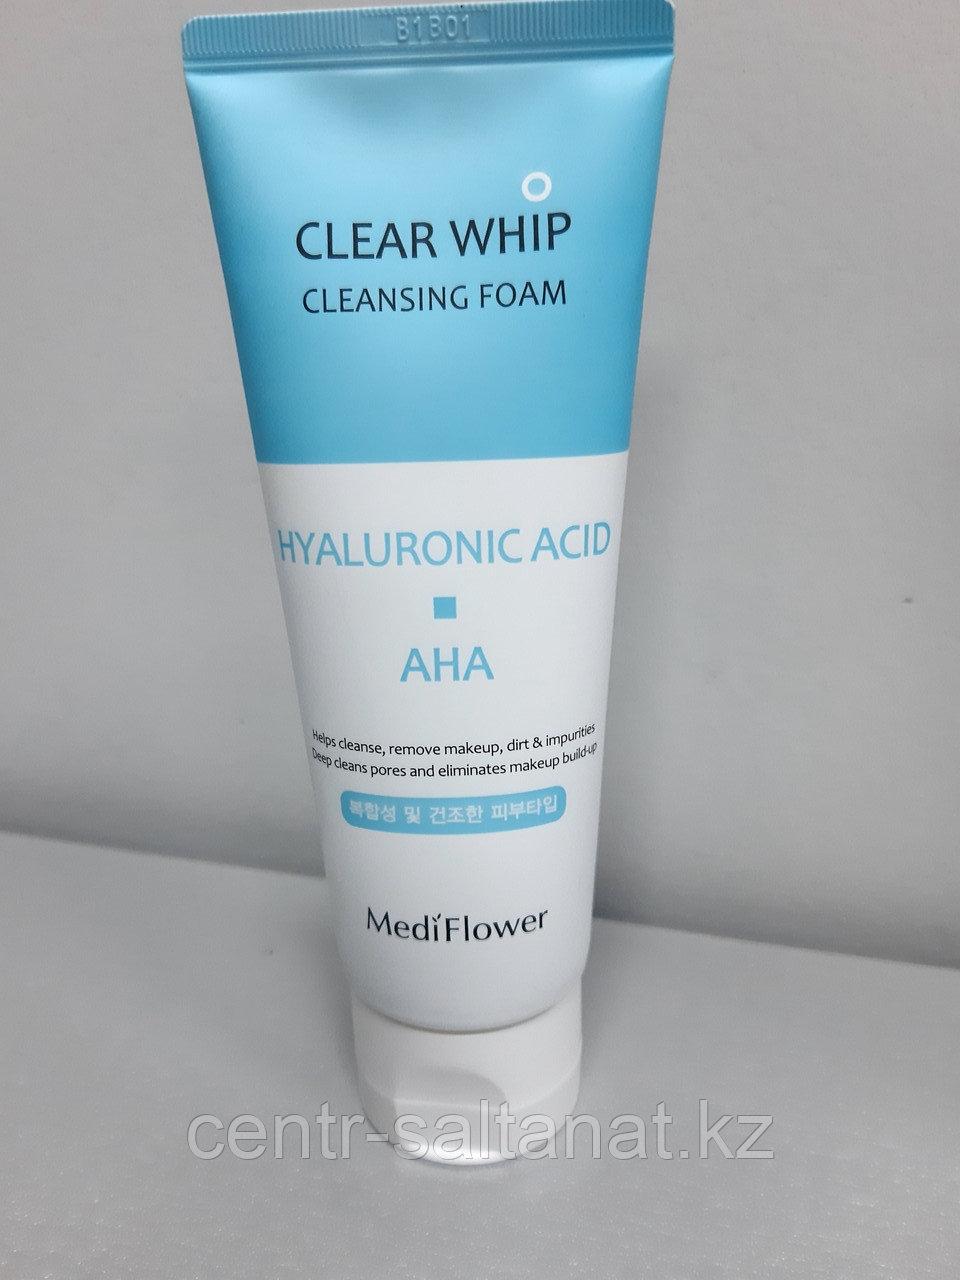 Пенка для умывания Hyaluronic acid&АНА Clear Whip Cleansing Foam 120 мл